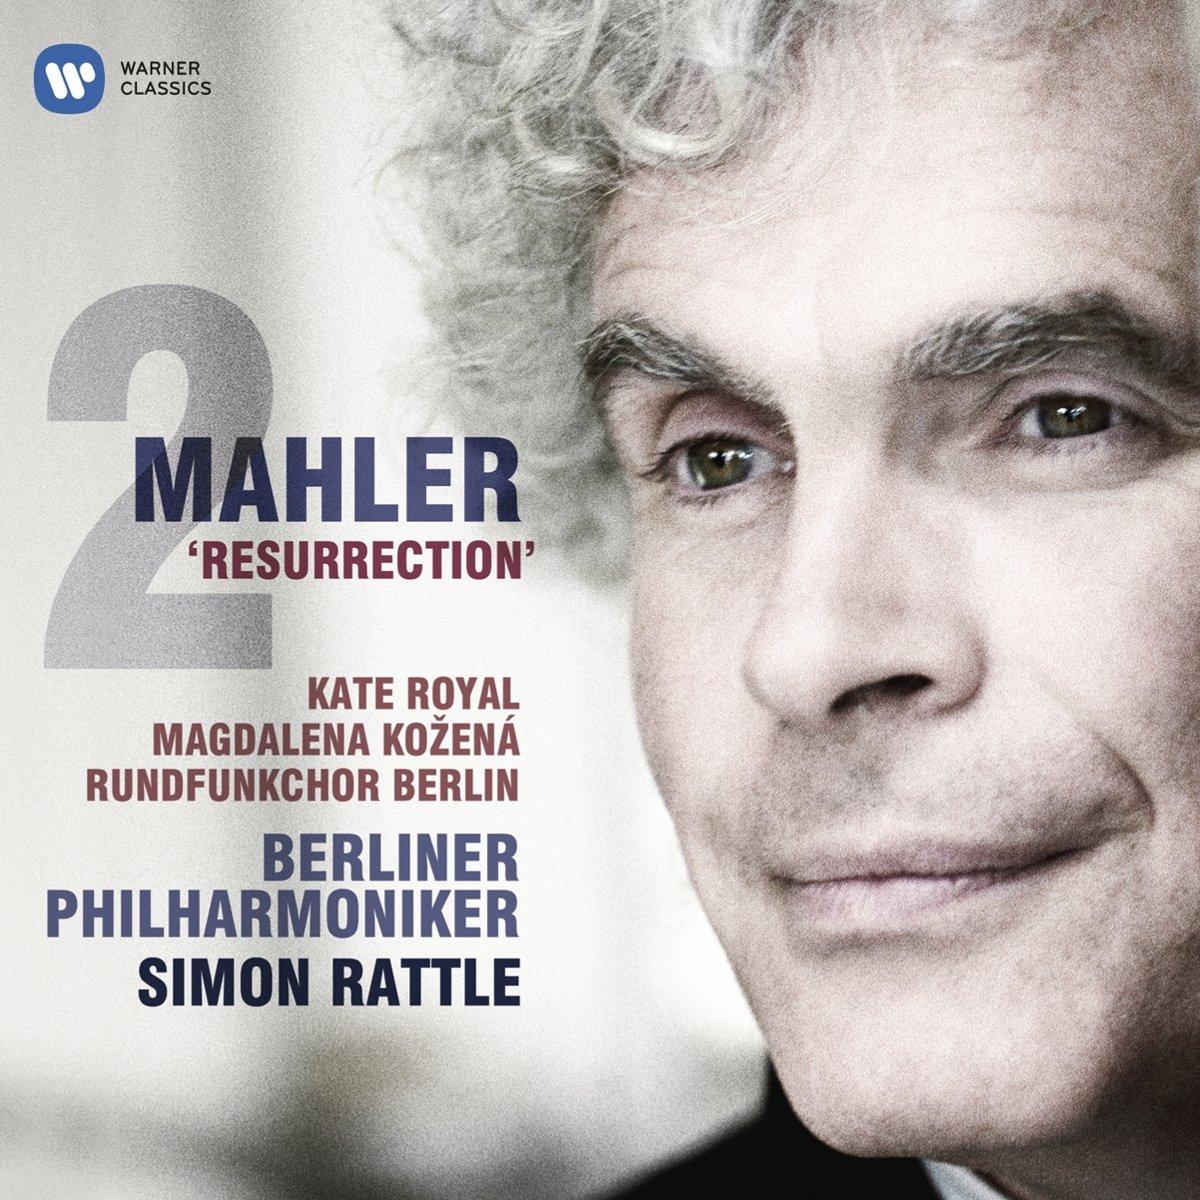 CD : Simon Rattle - Symphony No 2 In C Minor Resurrection (2PC)